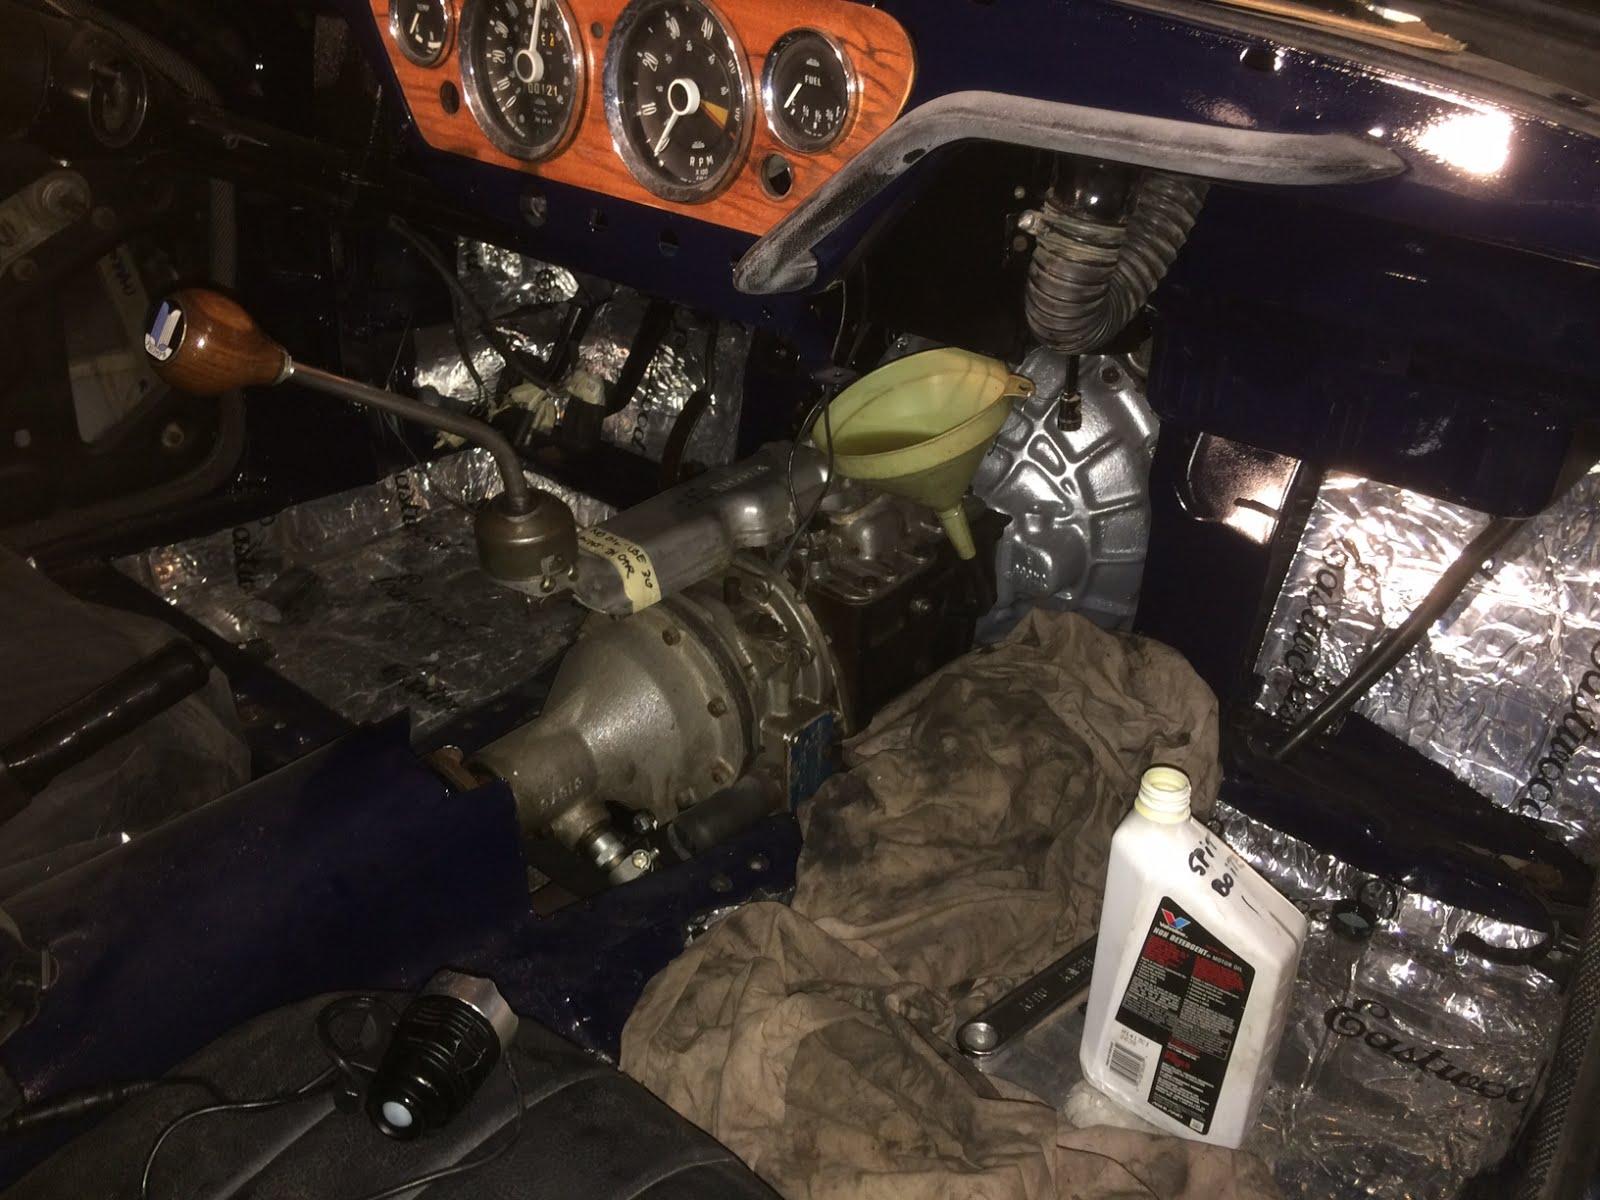 1967 Mk3 Spitfire Restoration Putting Oil In The Spitfire Gearbox